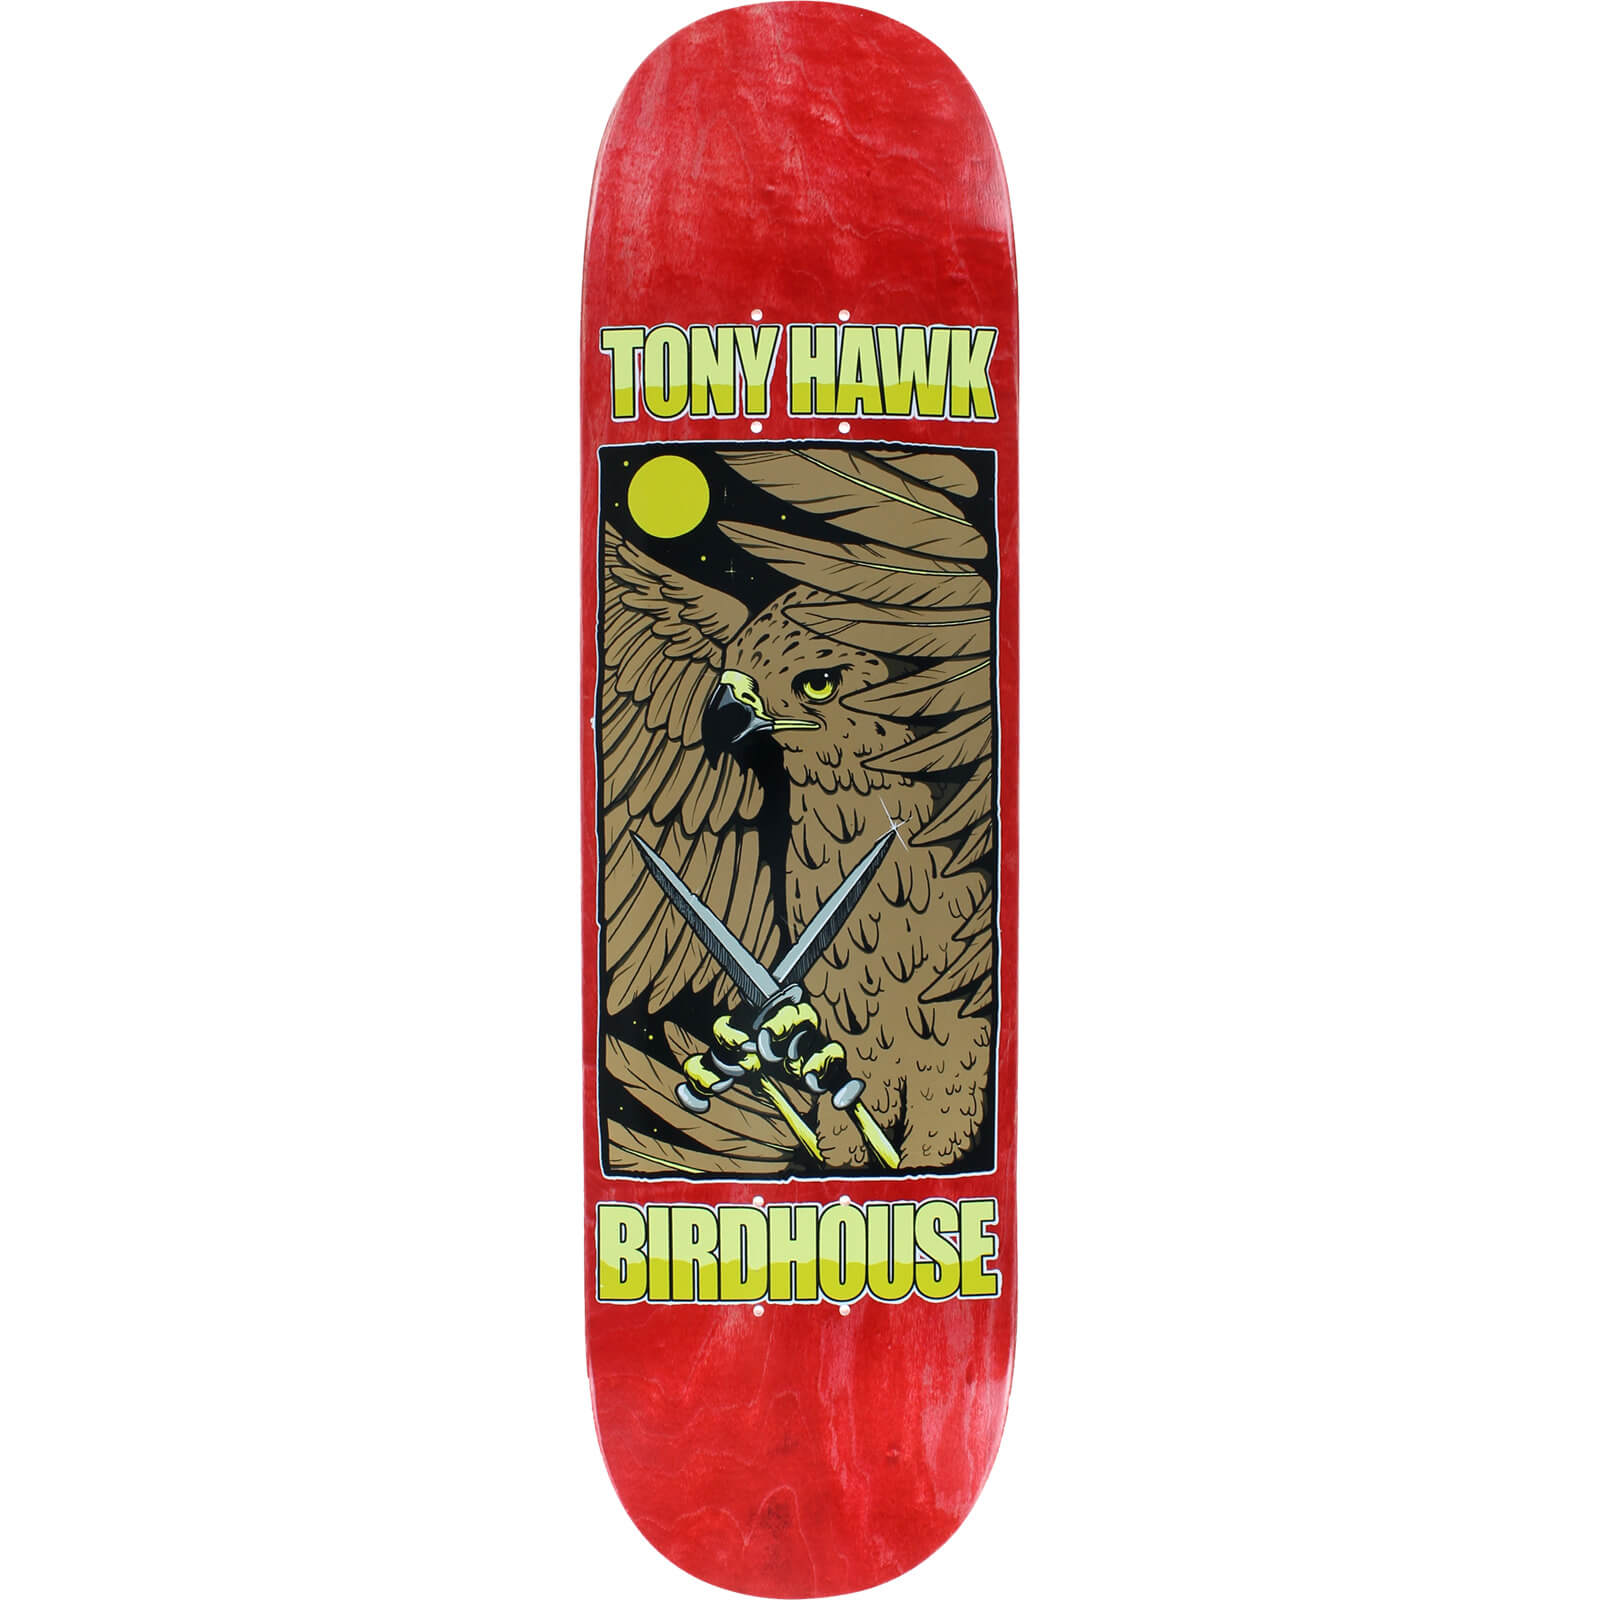 Birdhouse Skateboards Tony Hawk Knight Skateboard Deck 8